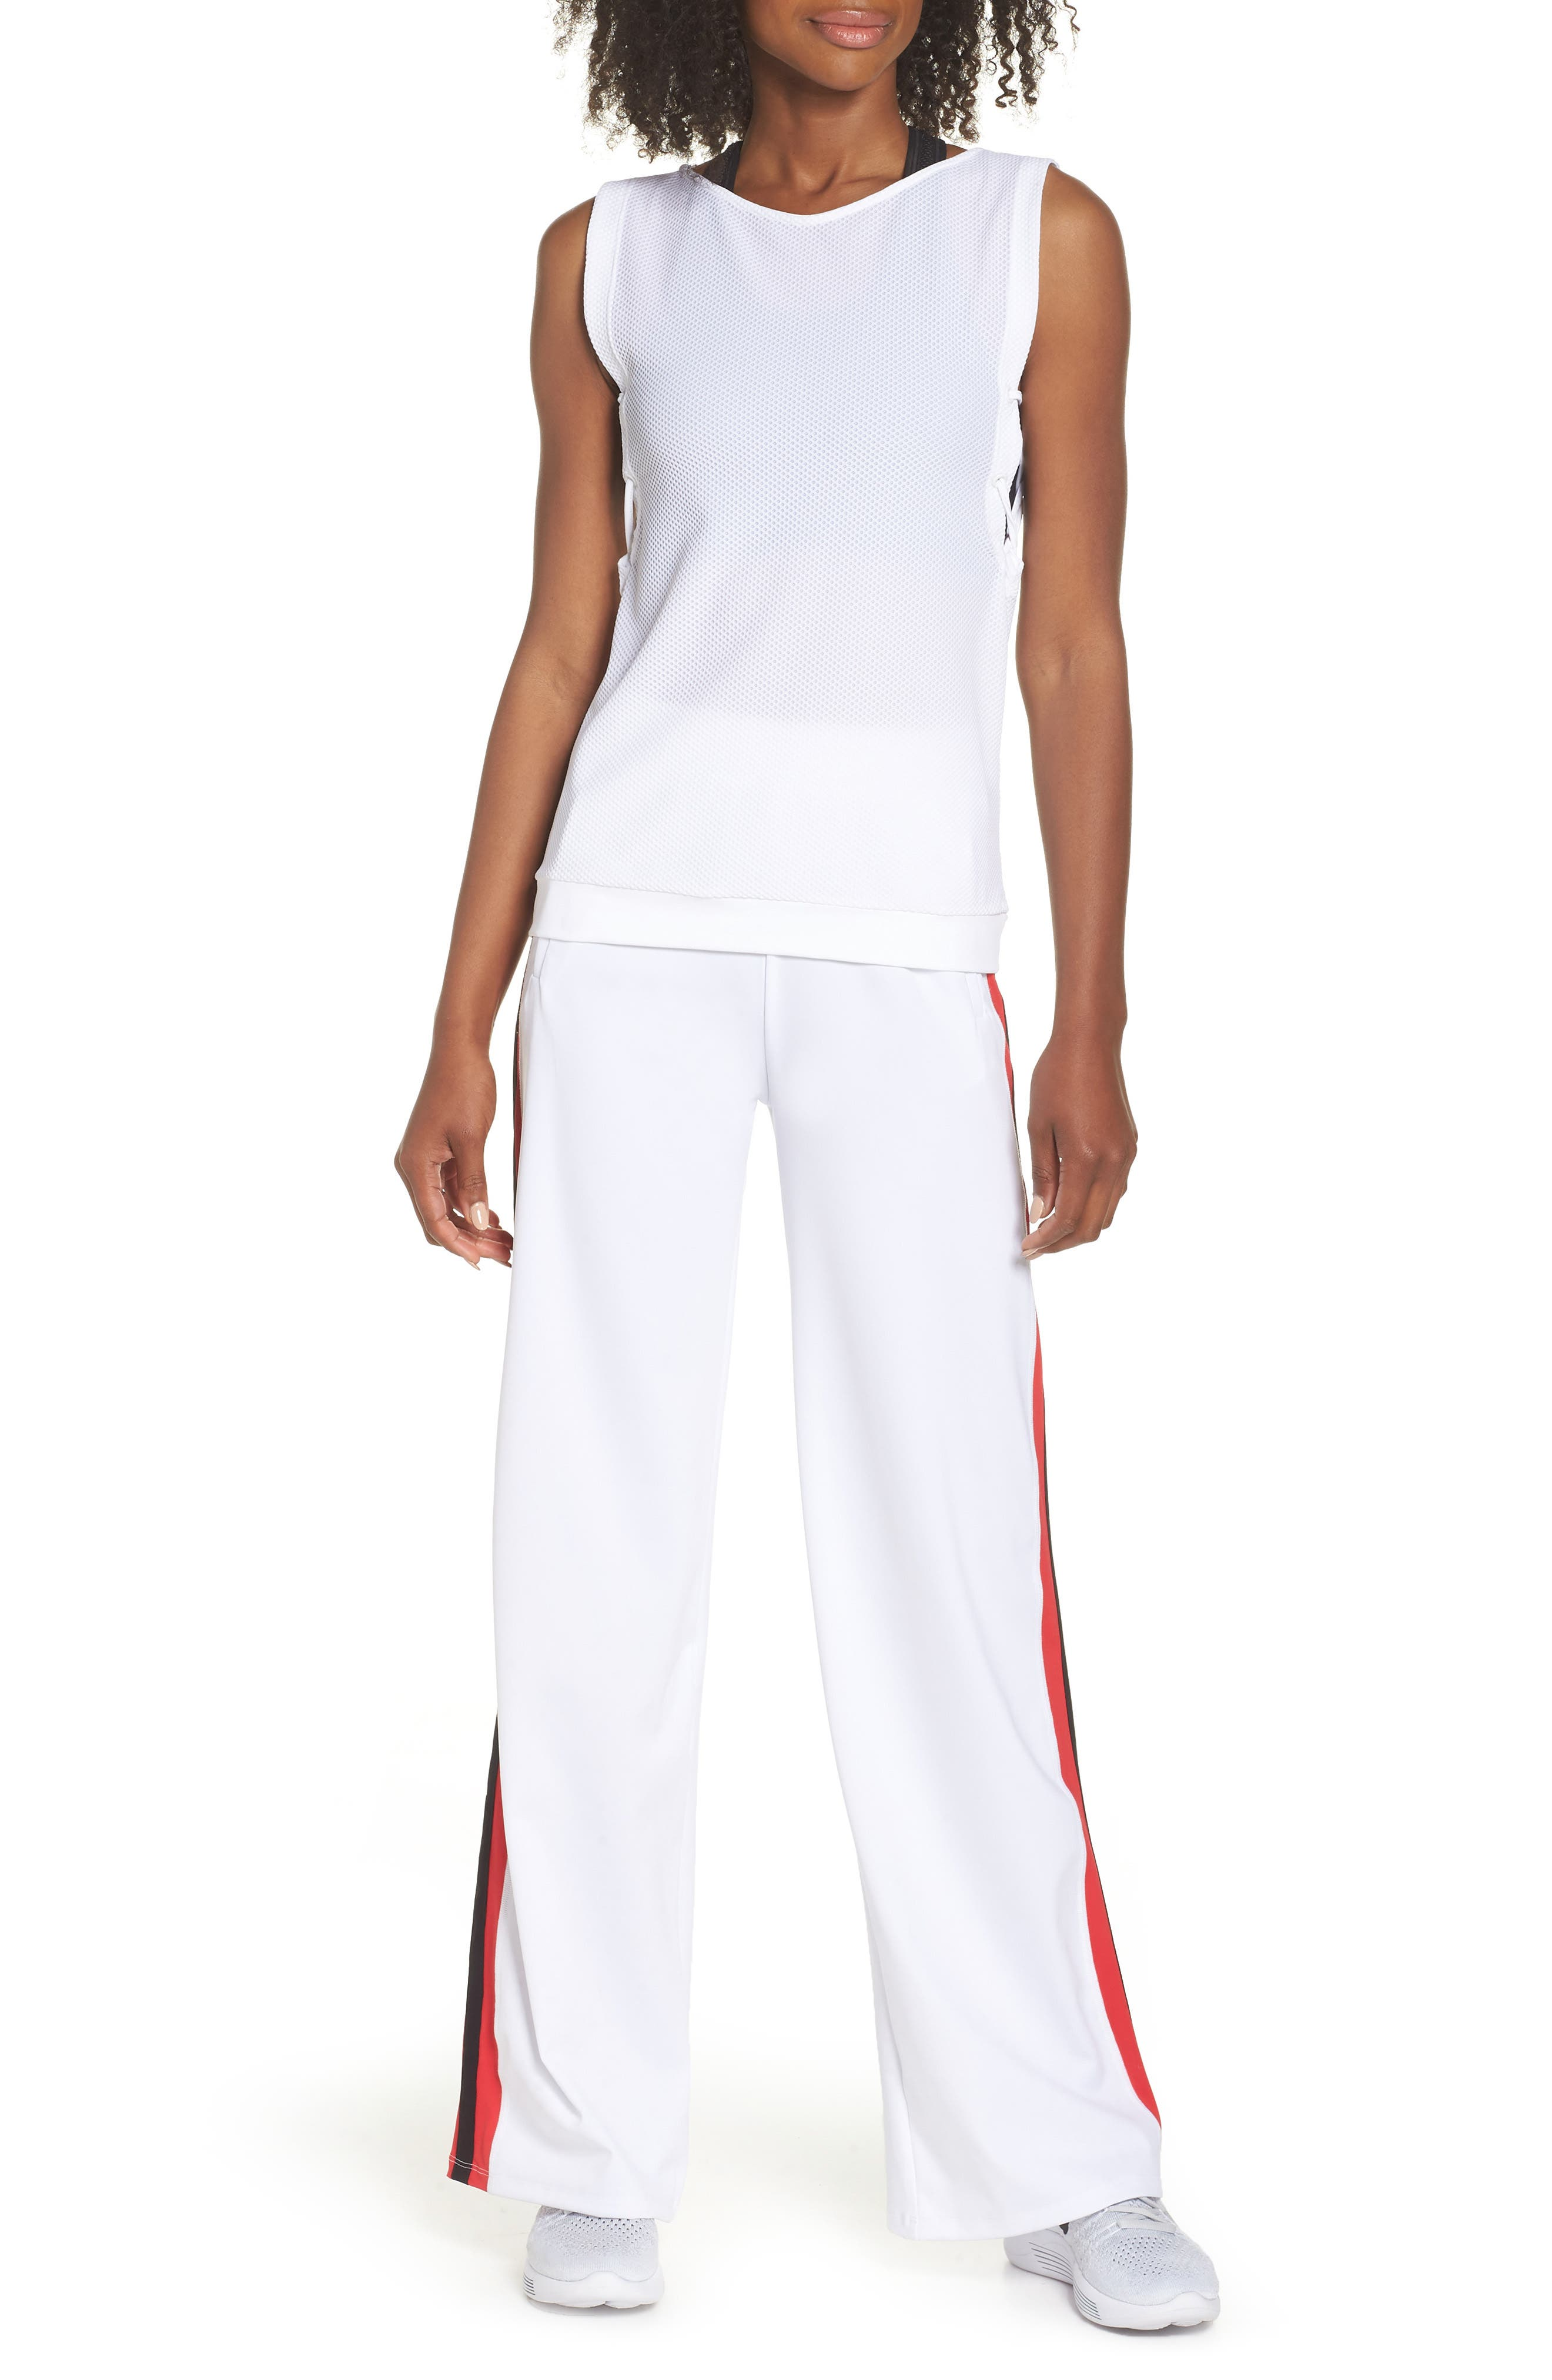 Wide Leg Track Pants,                             Alternate thumbnail 8, color,                             White/ Red/ Black